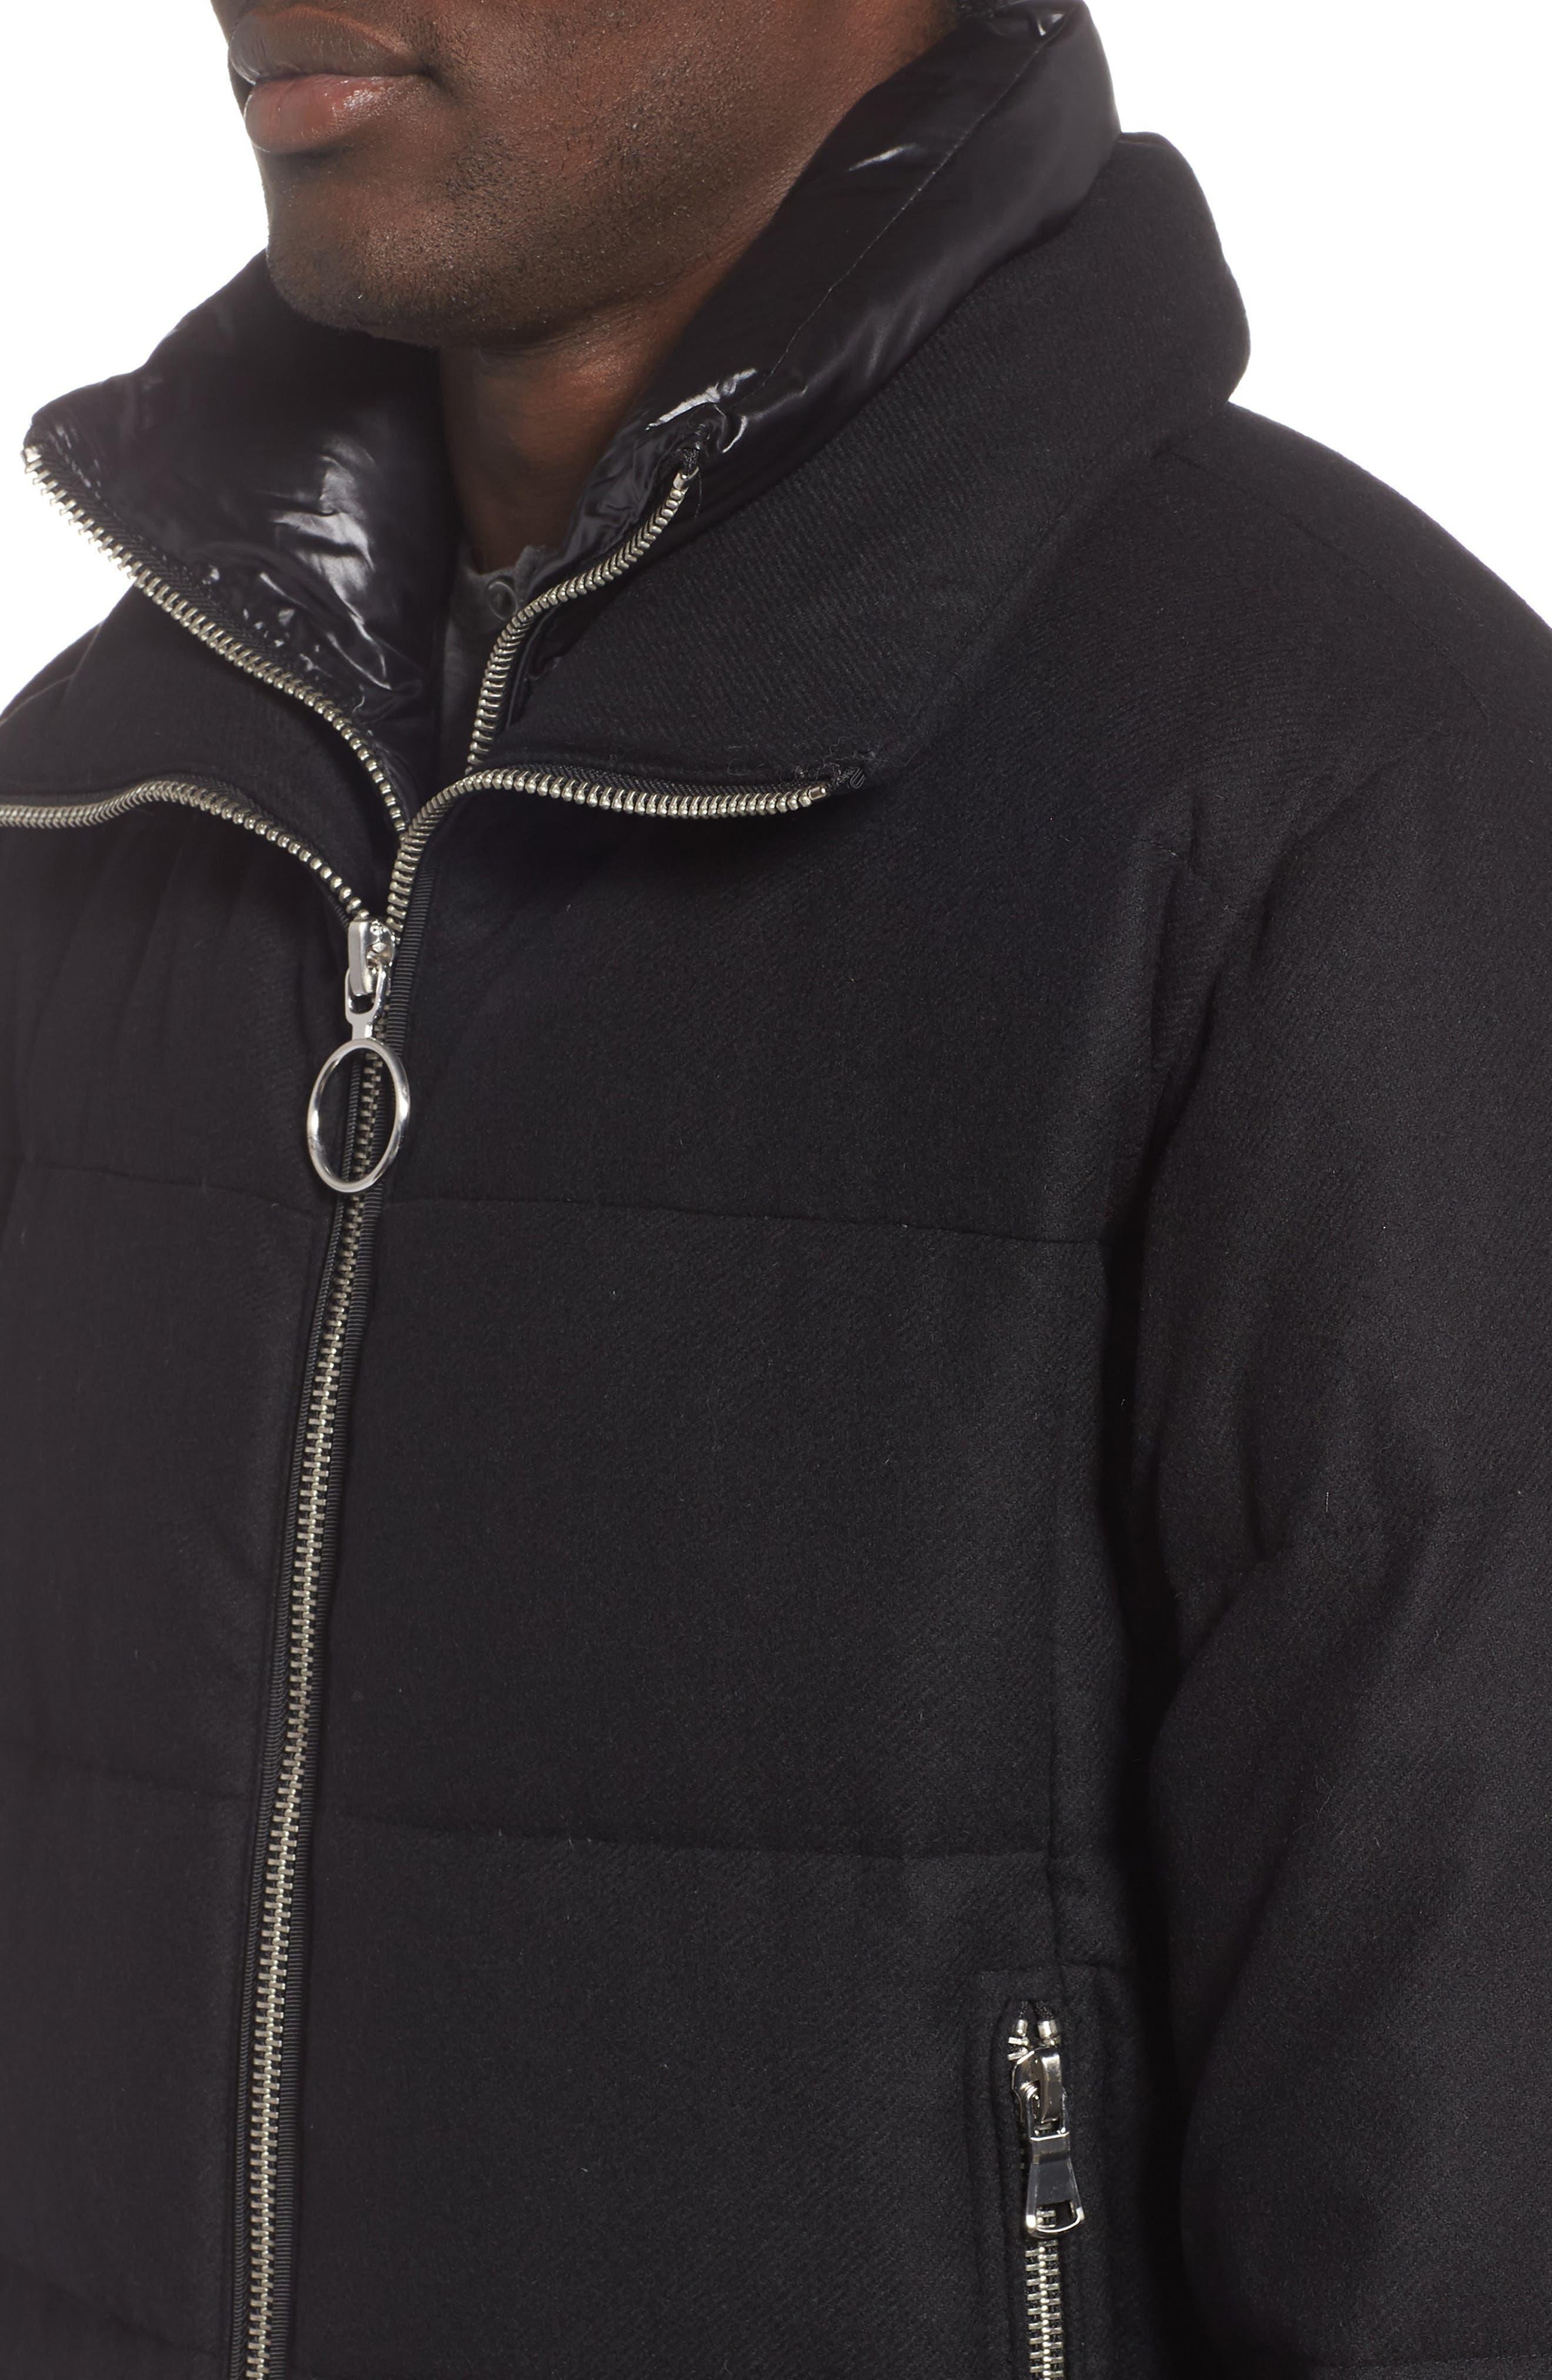 Wool Blend Puffer Jacket,                             Alternate thumbnail 4, color,                             BLACK